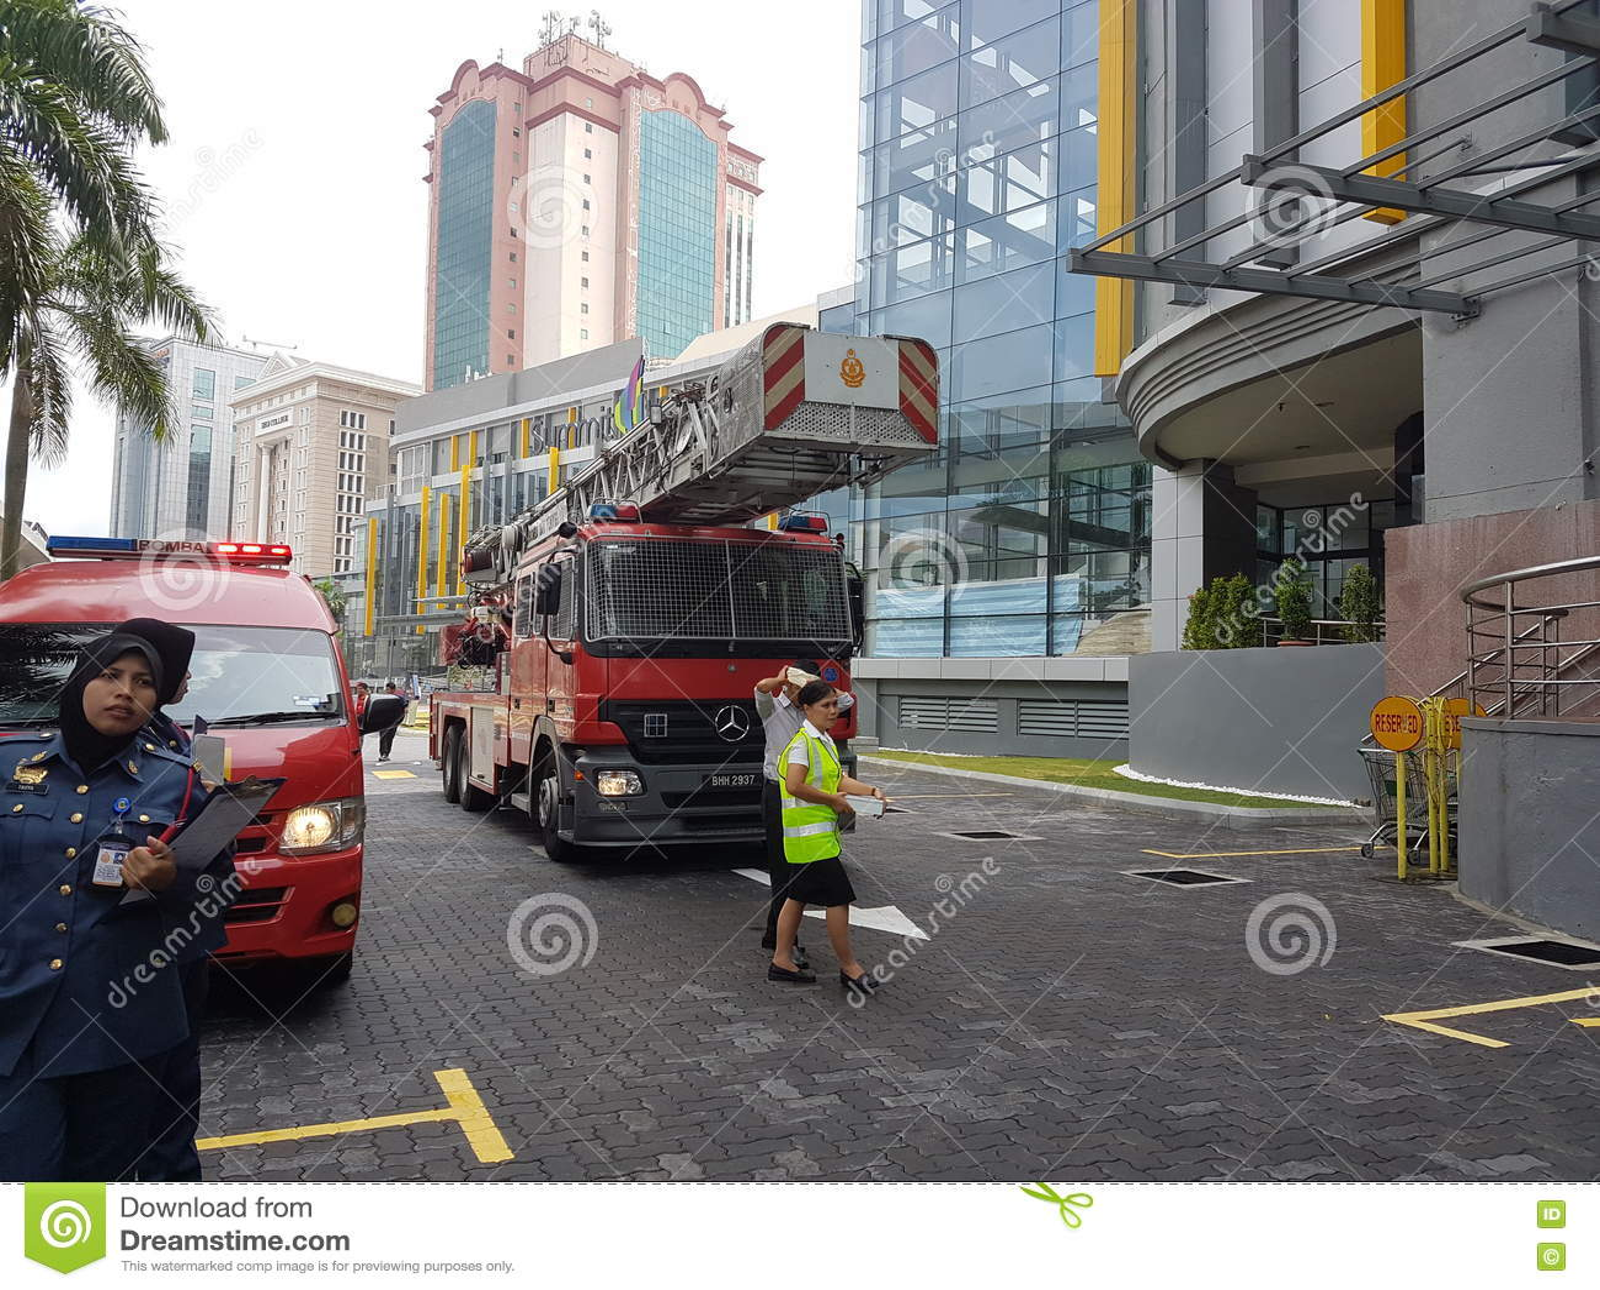 5. Oktober 2016 Subang Jaya, Malaysia Brandschutzübungs-Übung im Gipfel-Hotel Subang USJ war heute morgen erfolgt